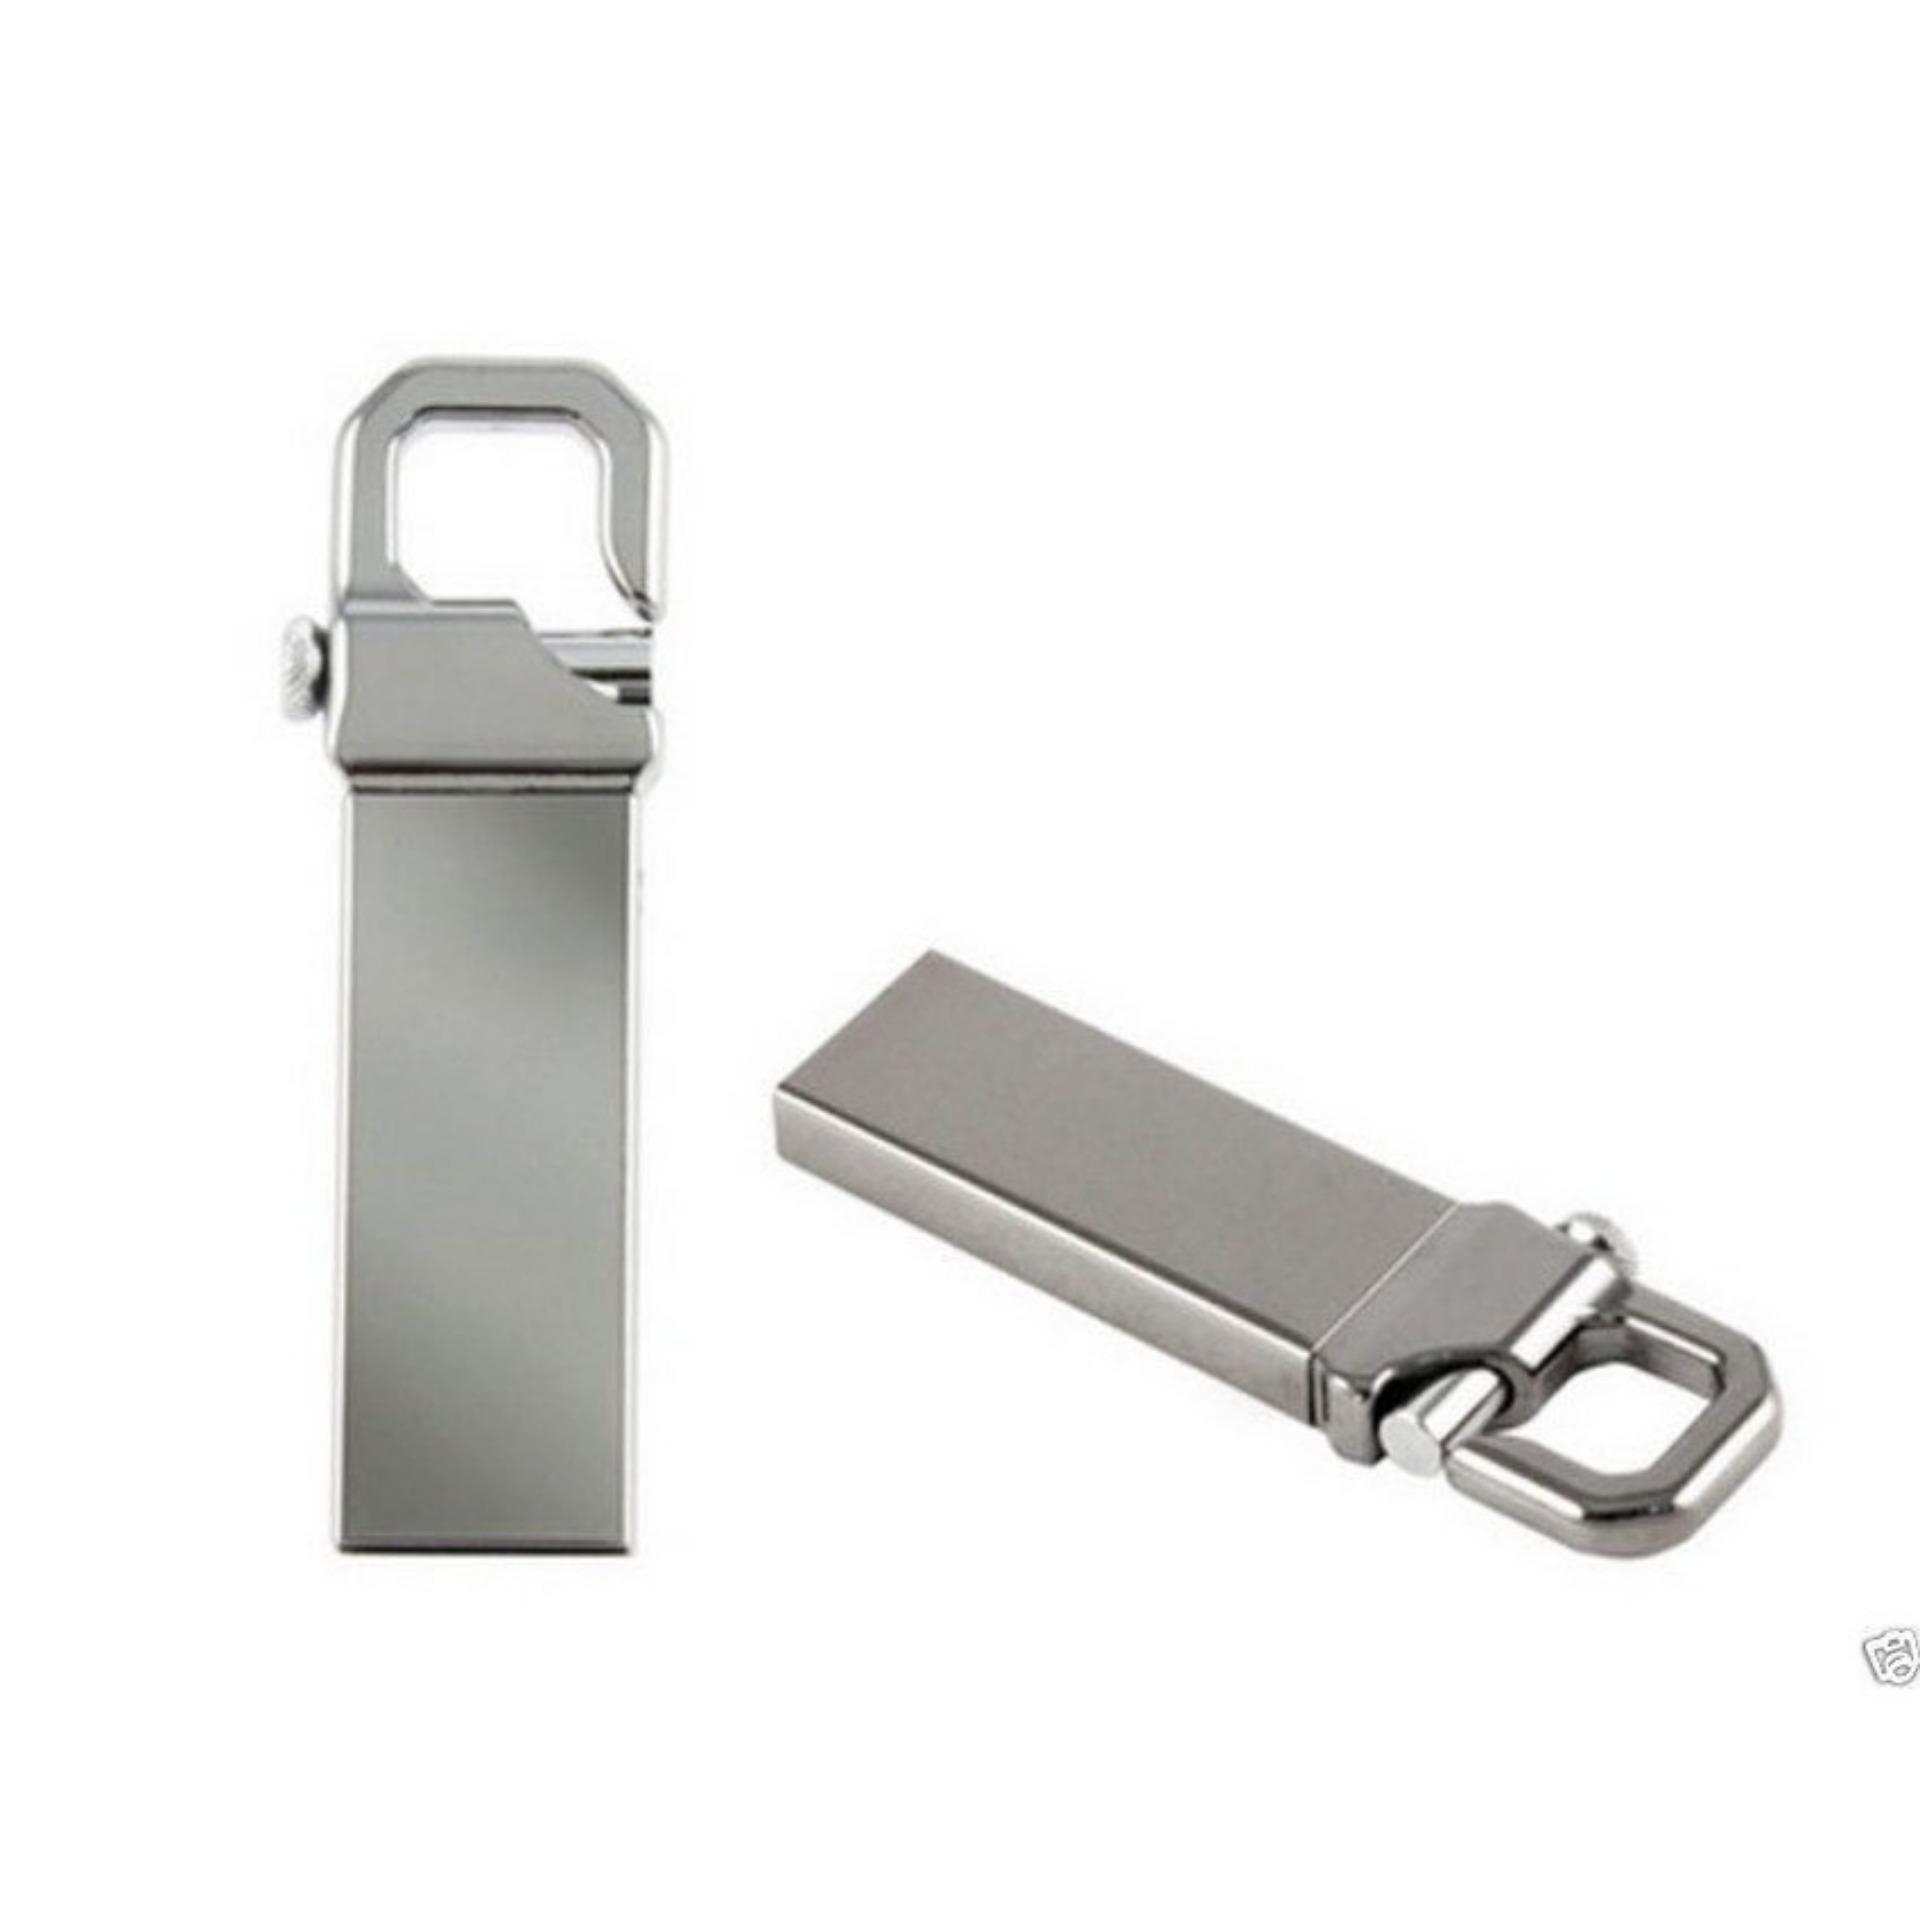 Buy Ugreen UGREEN 32GB OTG Drive Type C USB 3 0 Memory Stick Pen Source · The Metal Usb Flash Drive Custom Logo Pen Drive with Key Chain UsbStick 1TB Usb 3